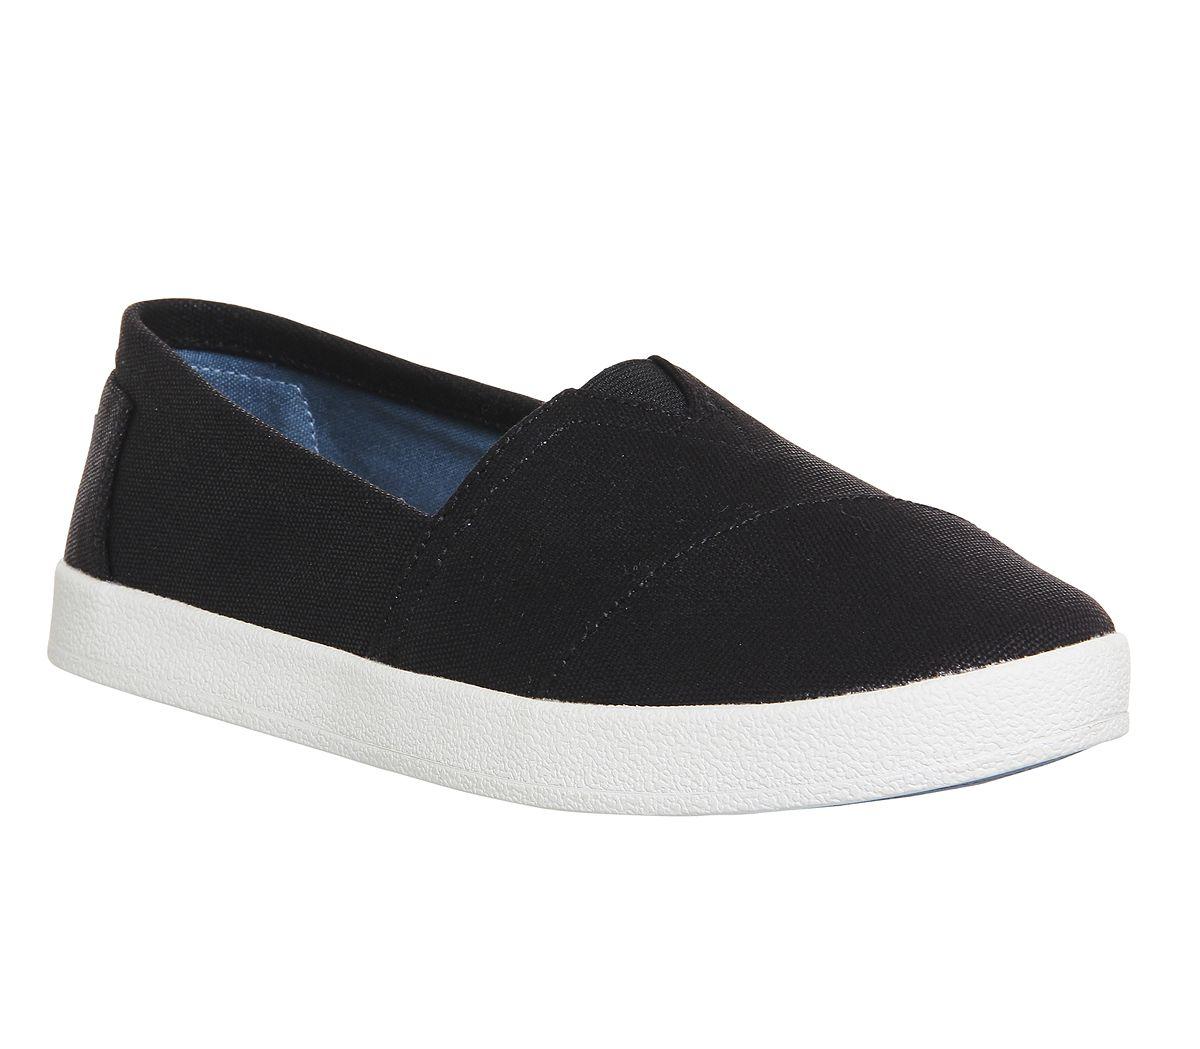 1b305b8de2ff Toms Avalon Sneaker Black Coated Canvas - Flats